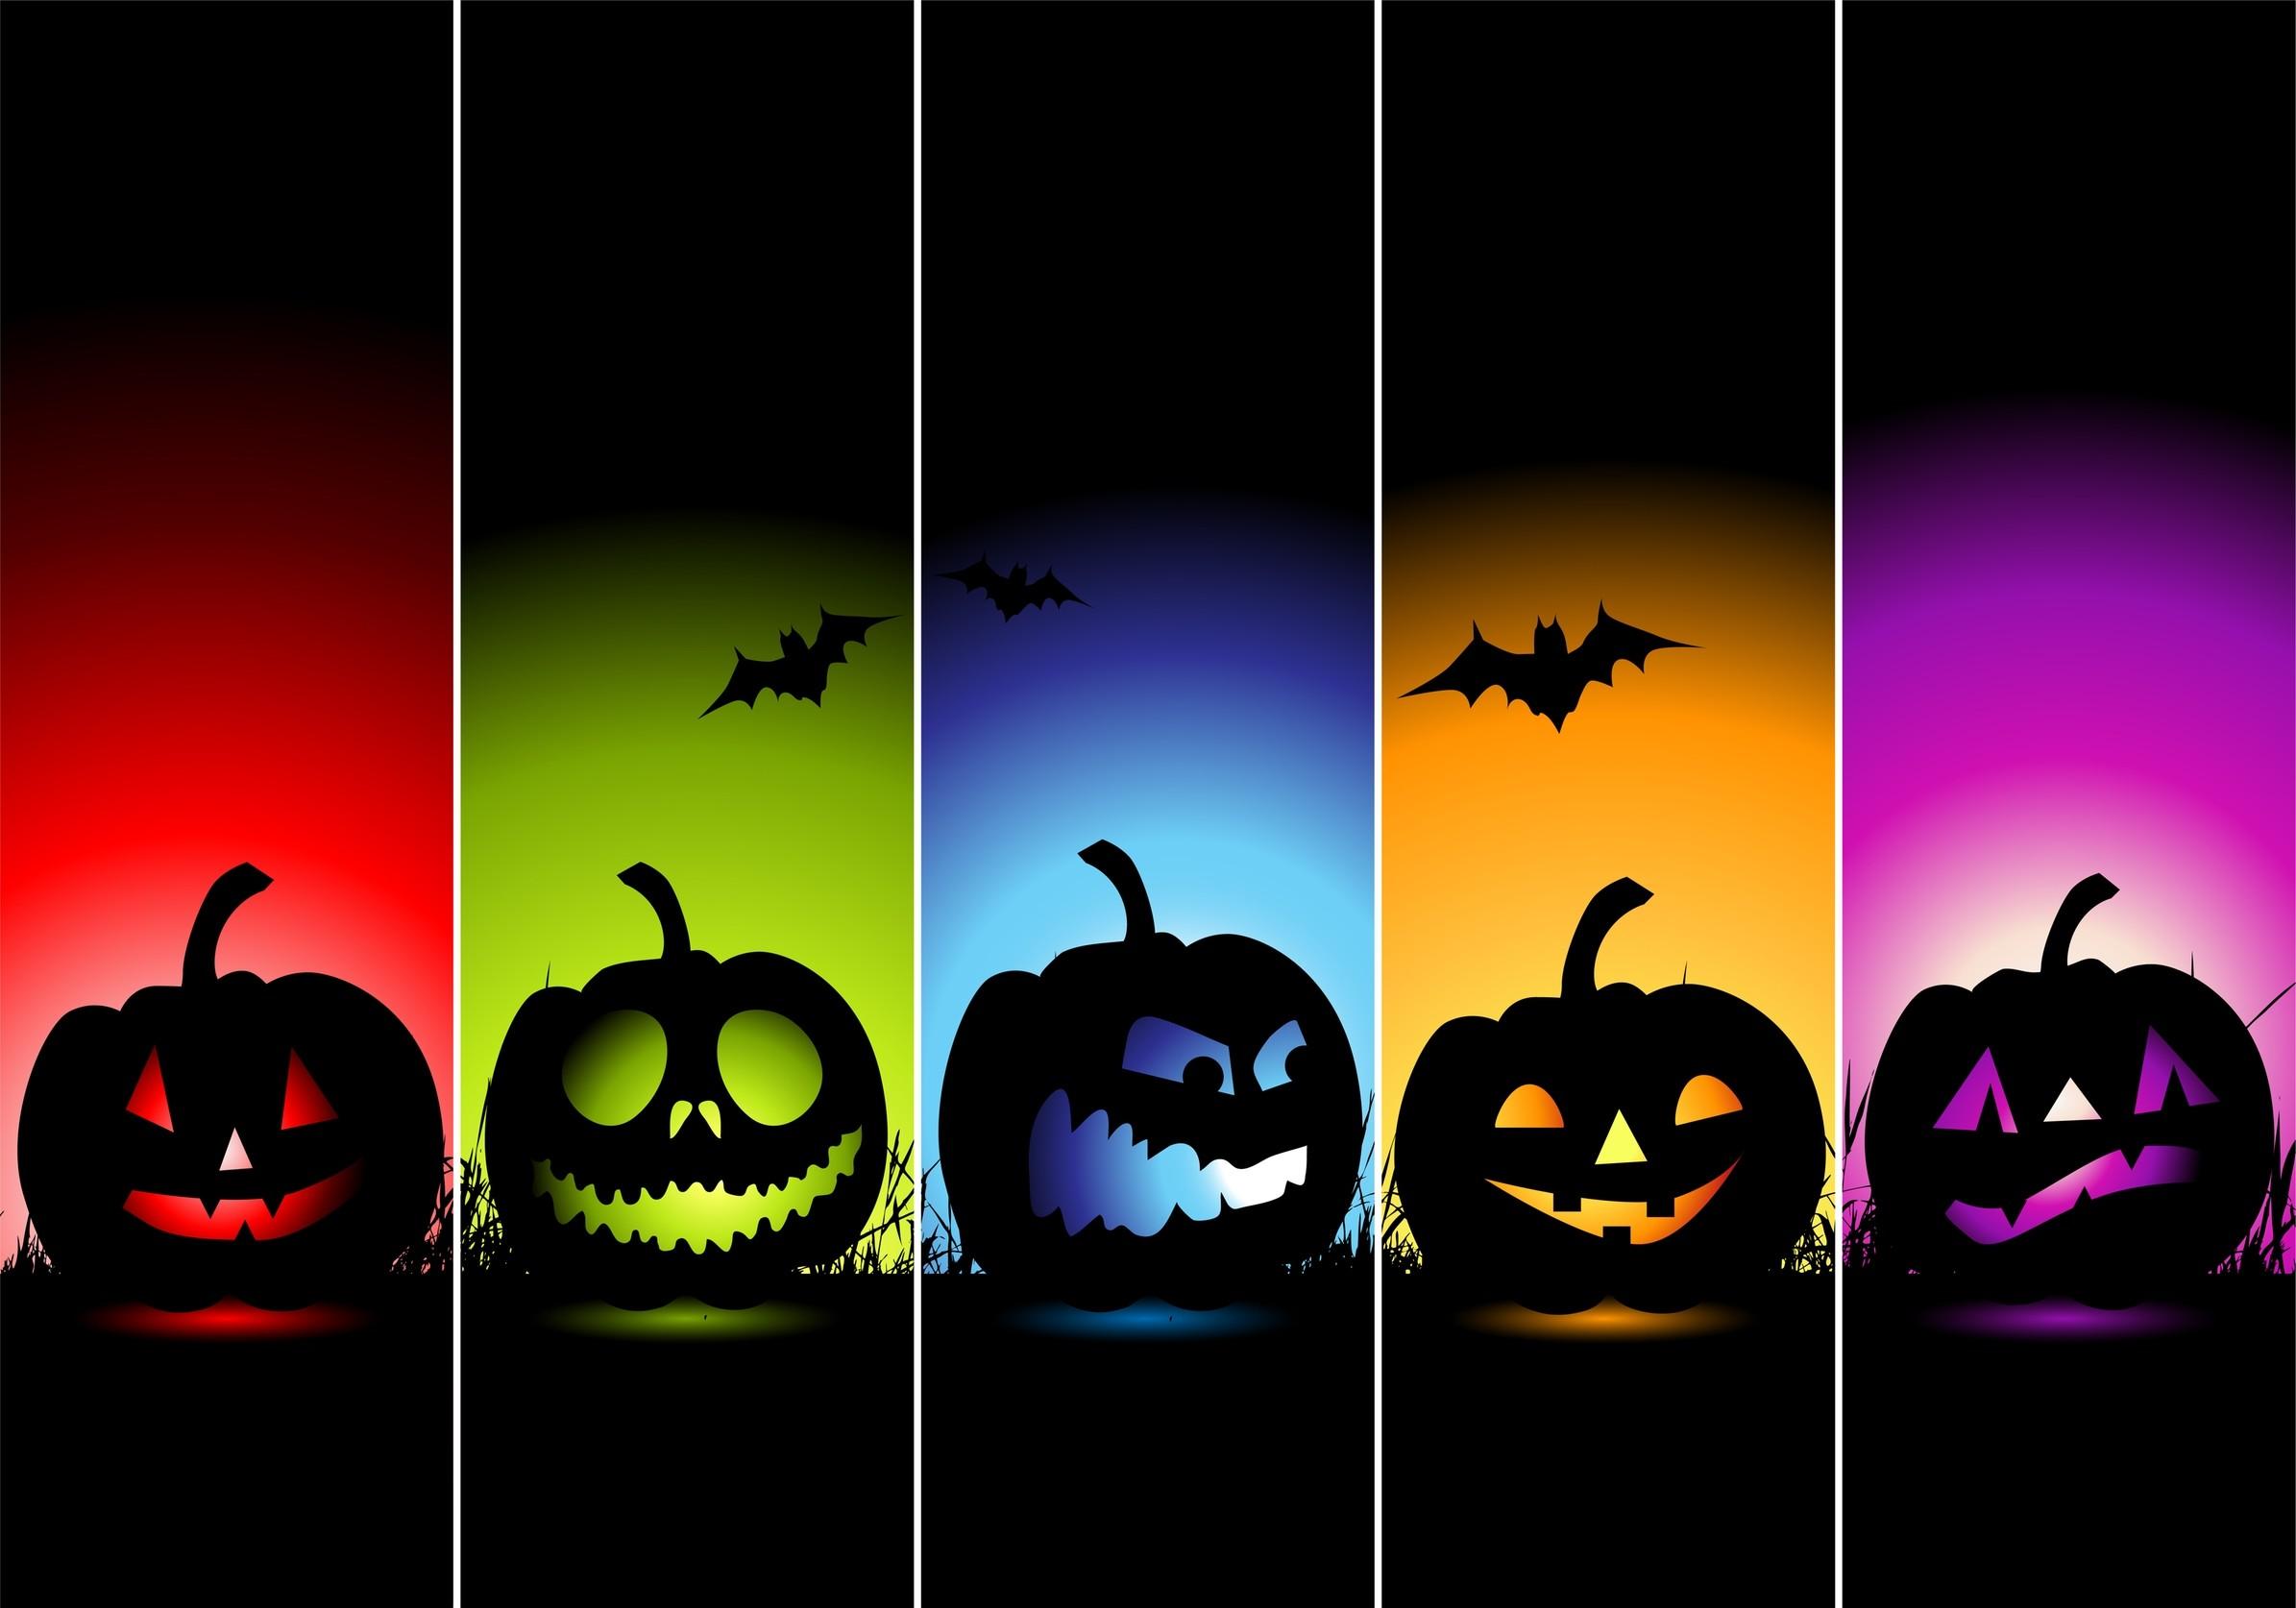 awesome halloween wallpaper ; cute-halloween-wallpaper-backgrounds